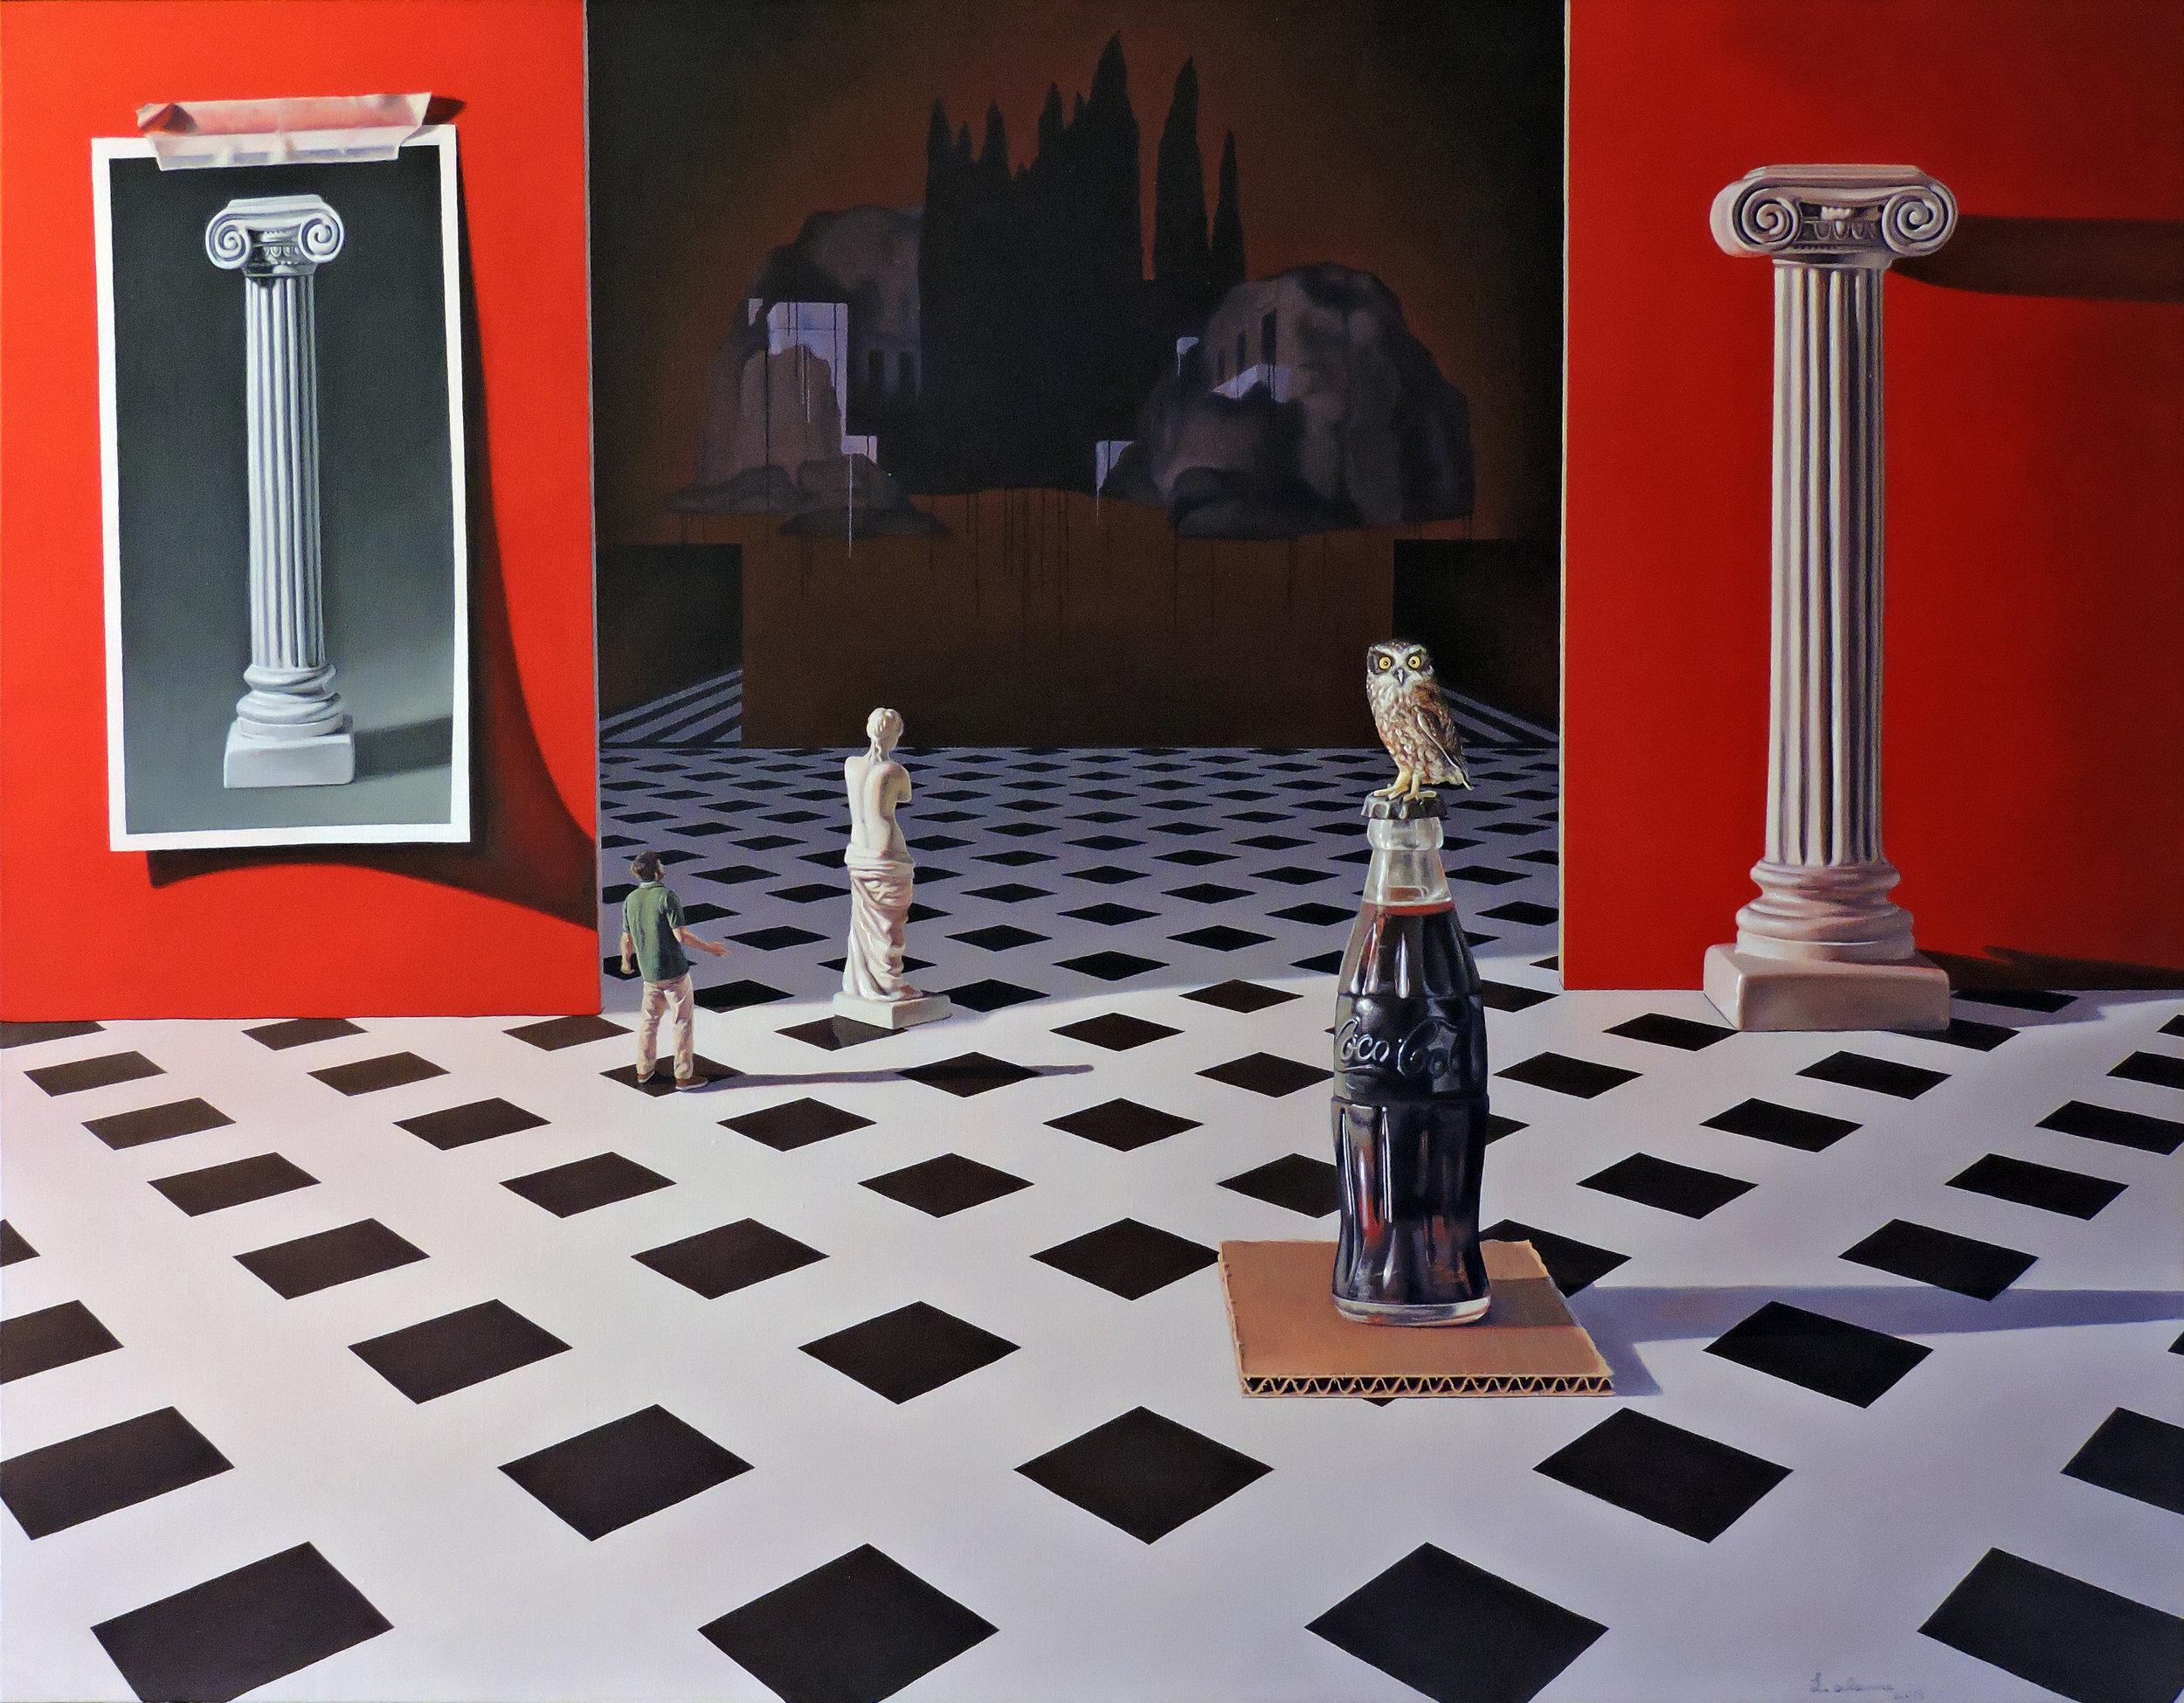 Joaquín Lalanne, Delicated Instant, 2018 Courtesy Galeria Zielinsky